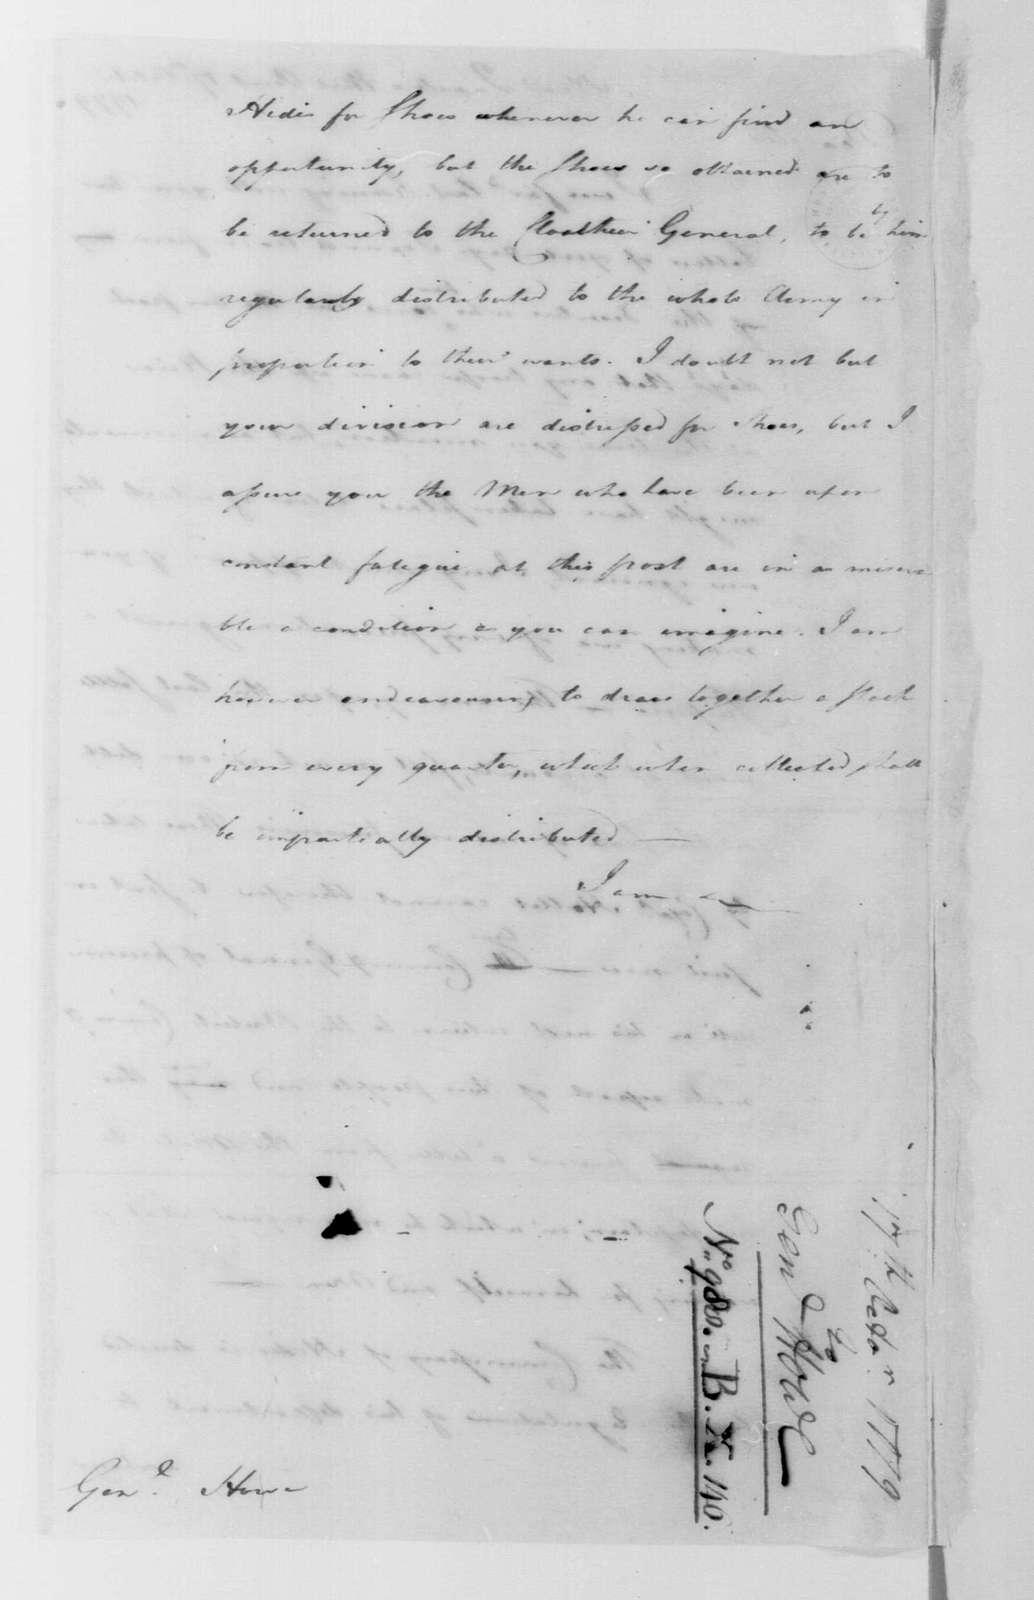 George Washington Papers, Series 4, General Correspondence: George Washington to Robert Howe, October 17, 1779, two same date